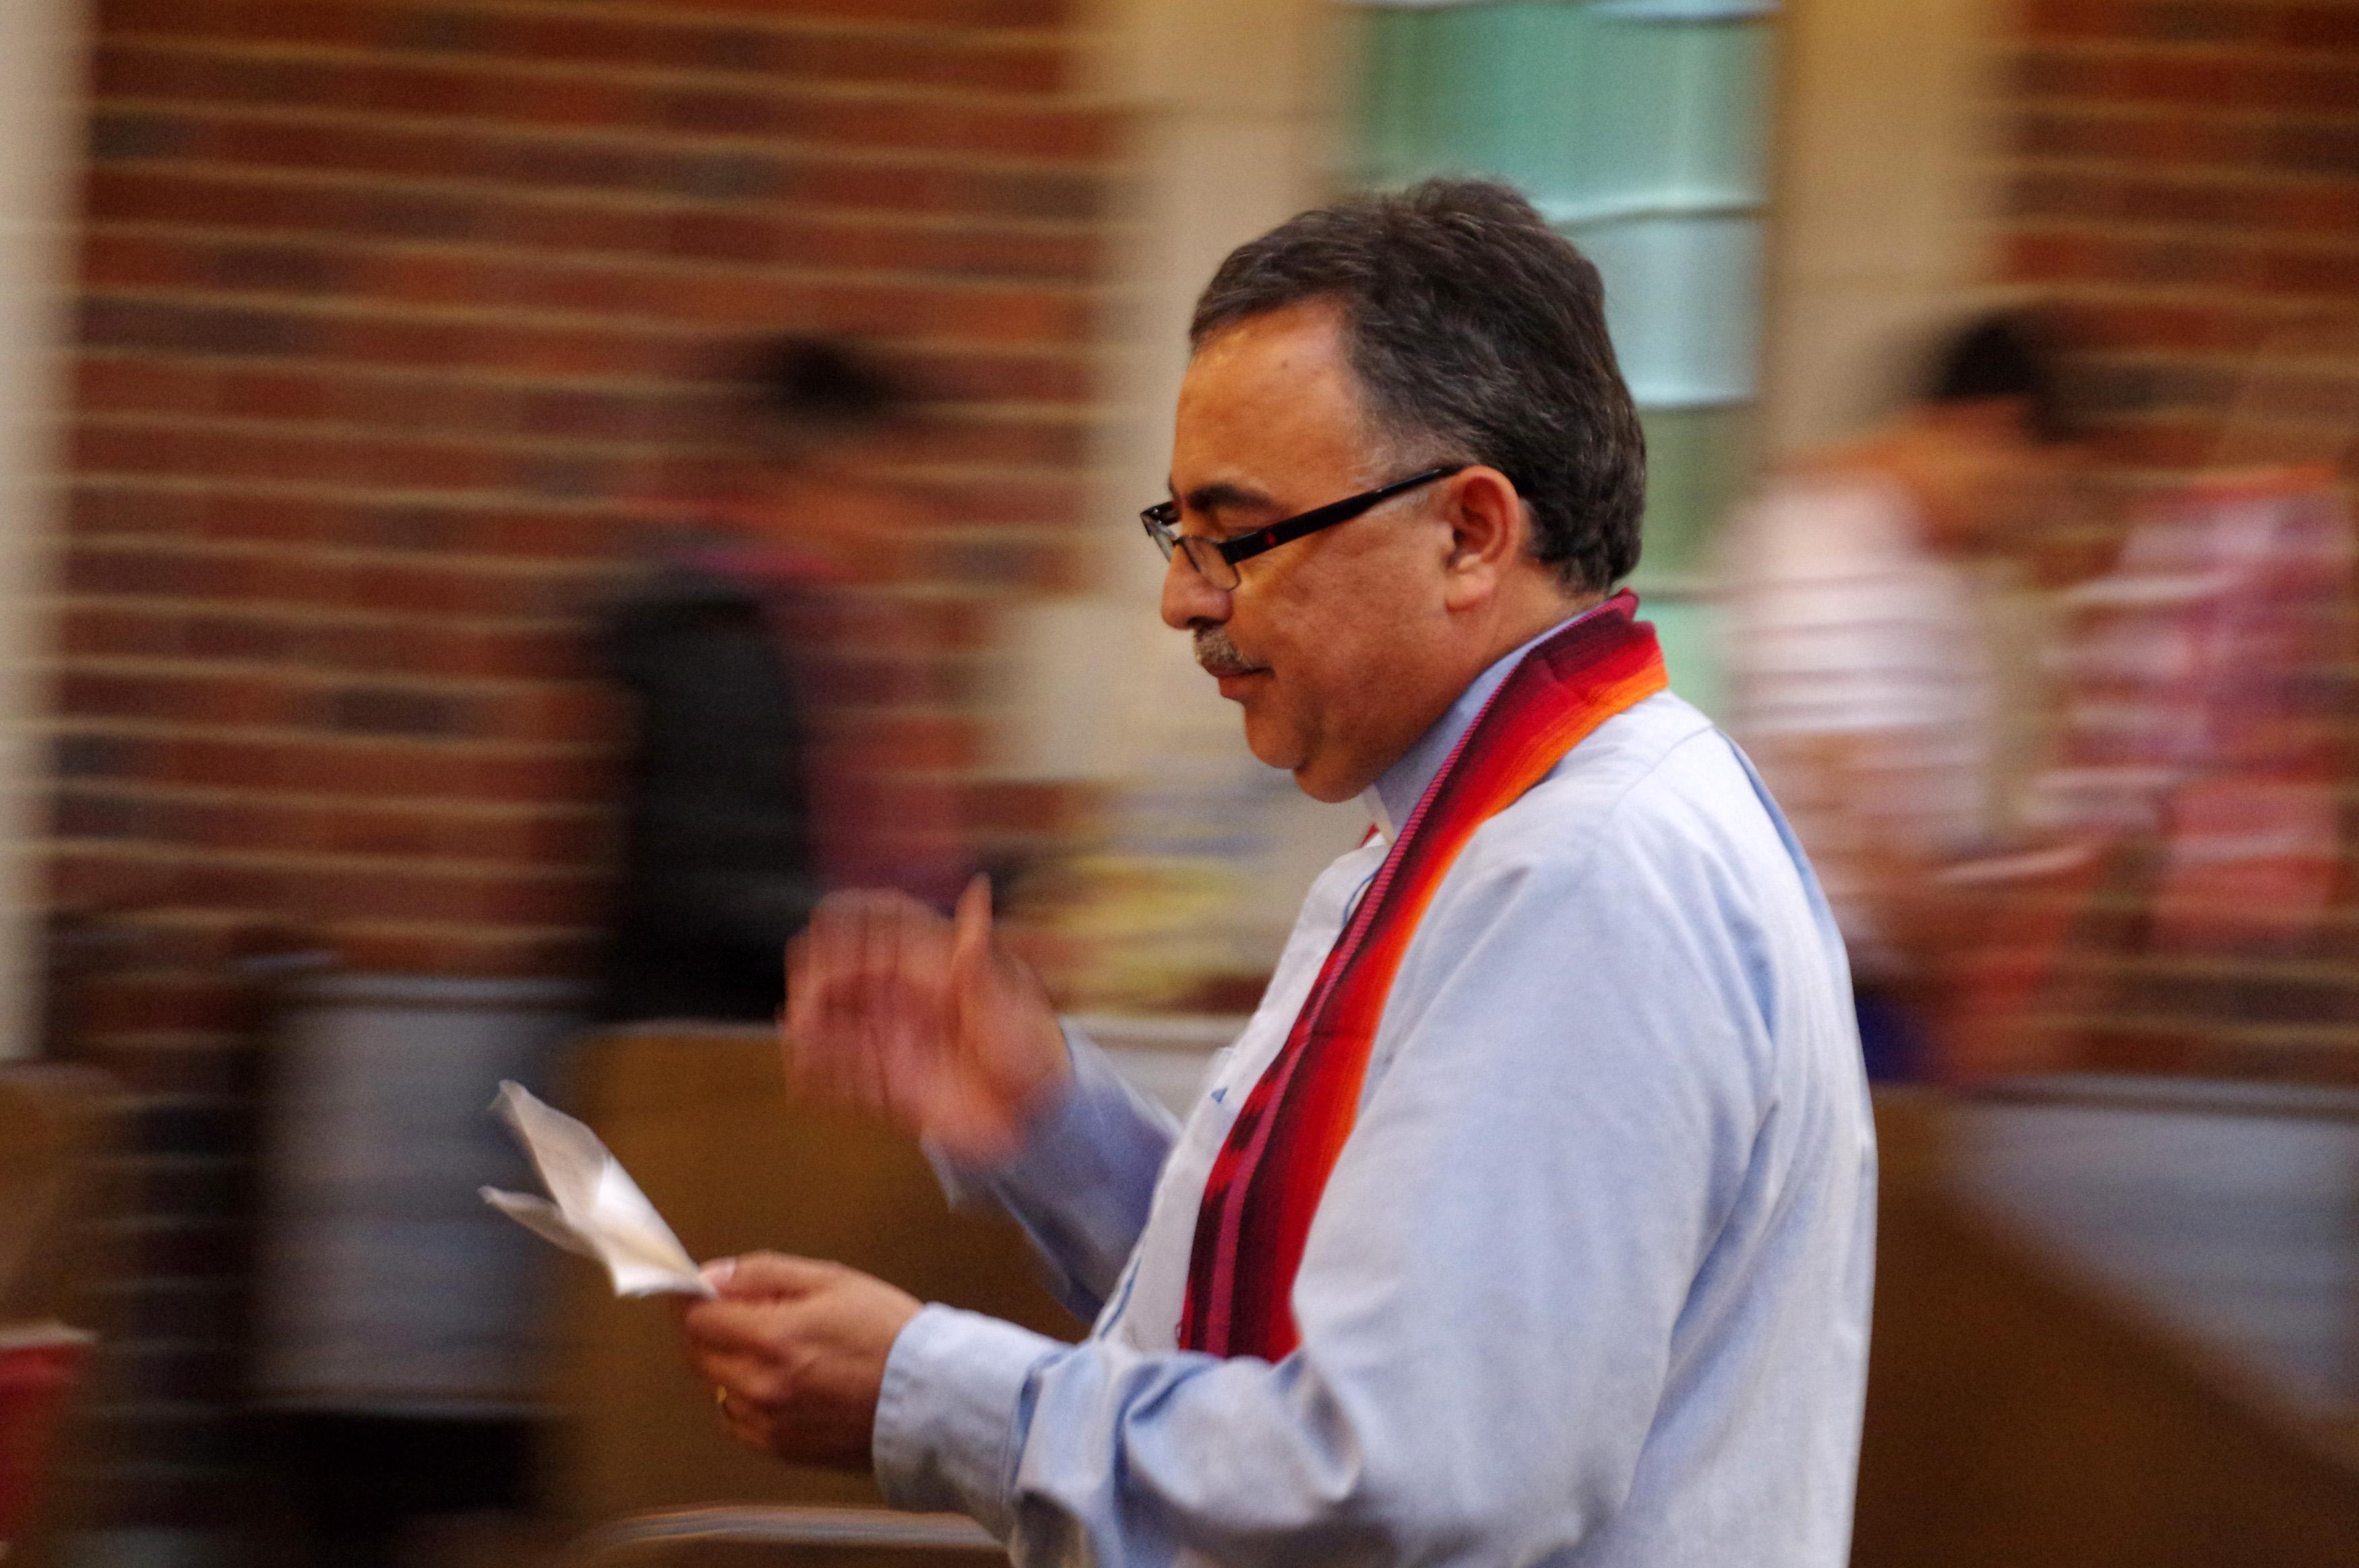 The Rev. David Martinez prepares to led the September 11 remembrance march from Scarritt Bennett to the Vanderbilt University chapel.  Photo by Gustavo Vasquez, United Methodist Communications